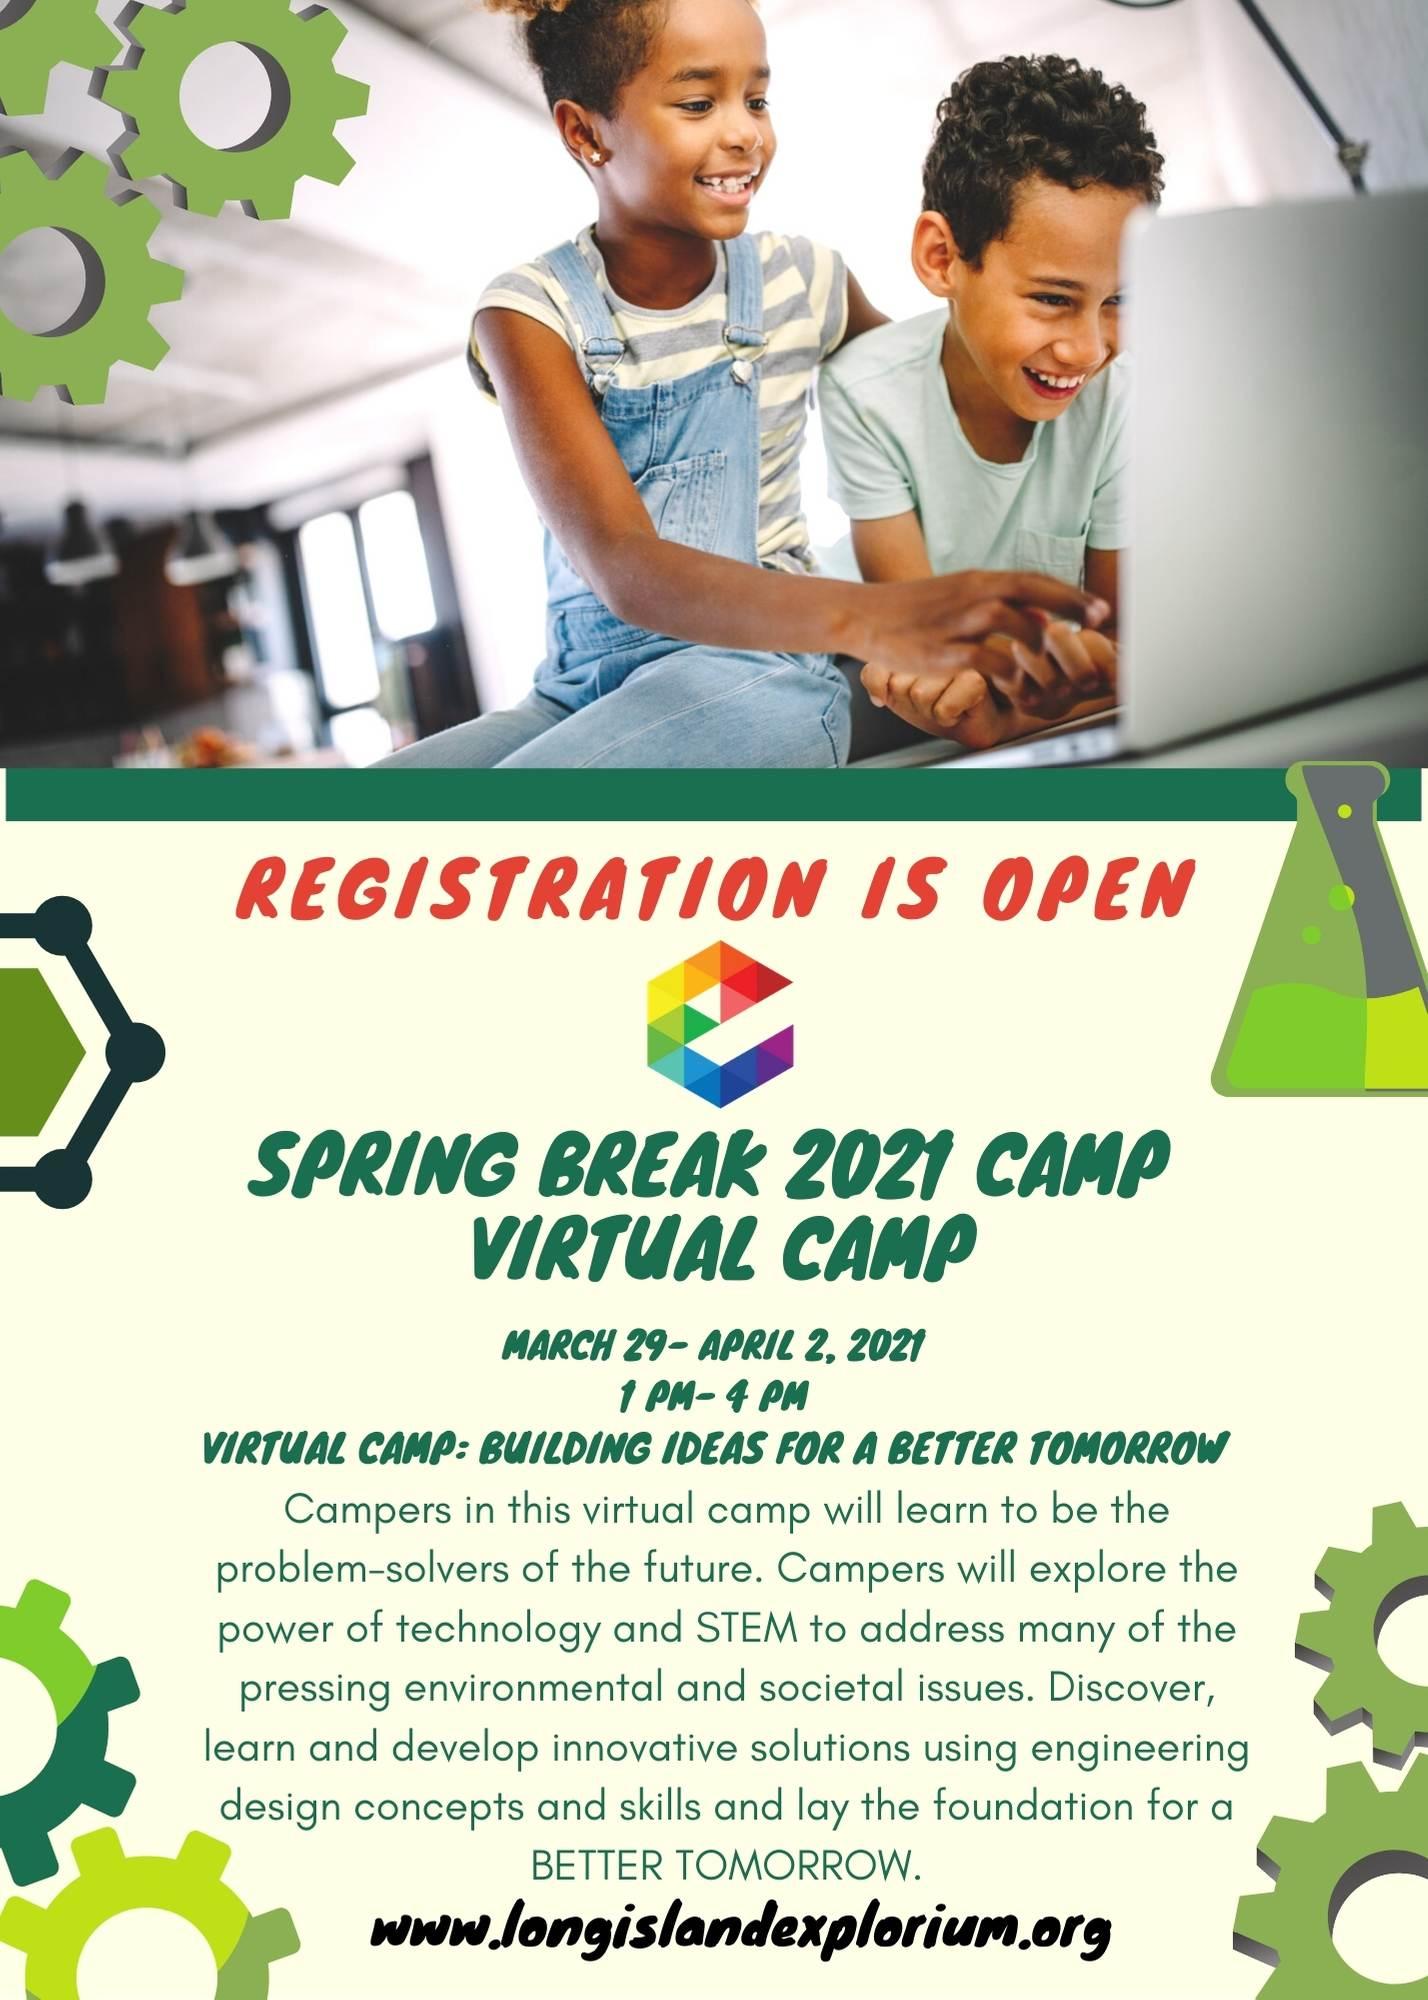 Spring Break 2021 flyer virtual